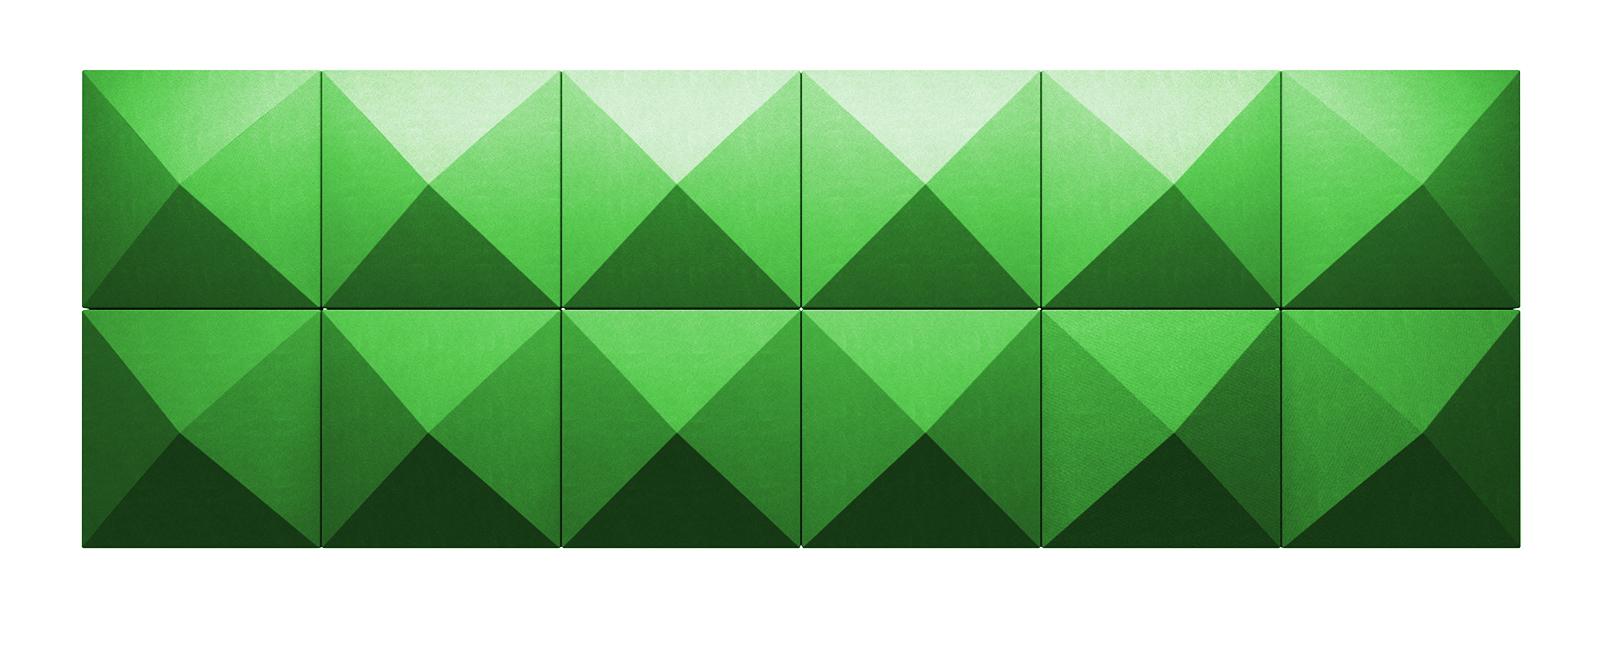 Autex Quietspace 3D Tiles S-5.37 | Granny Smith